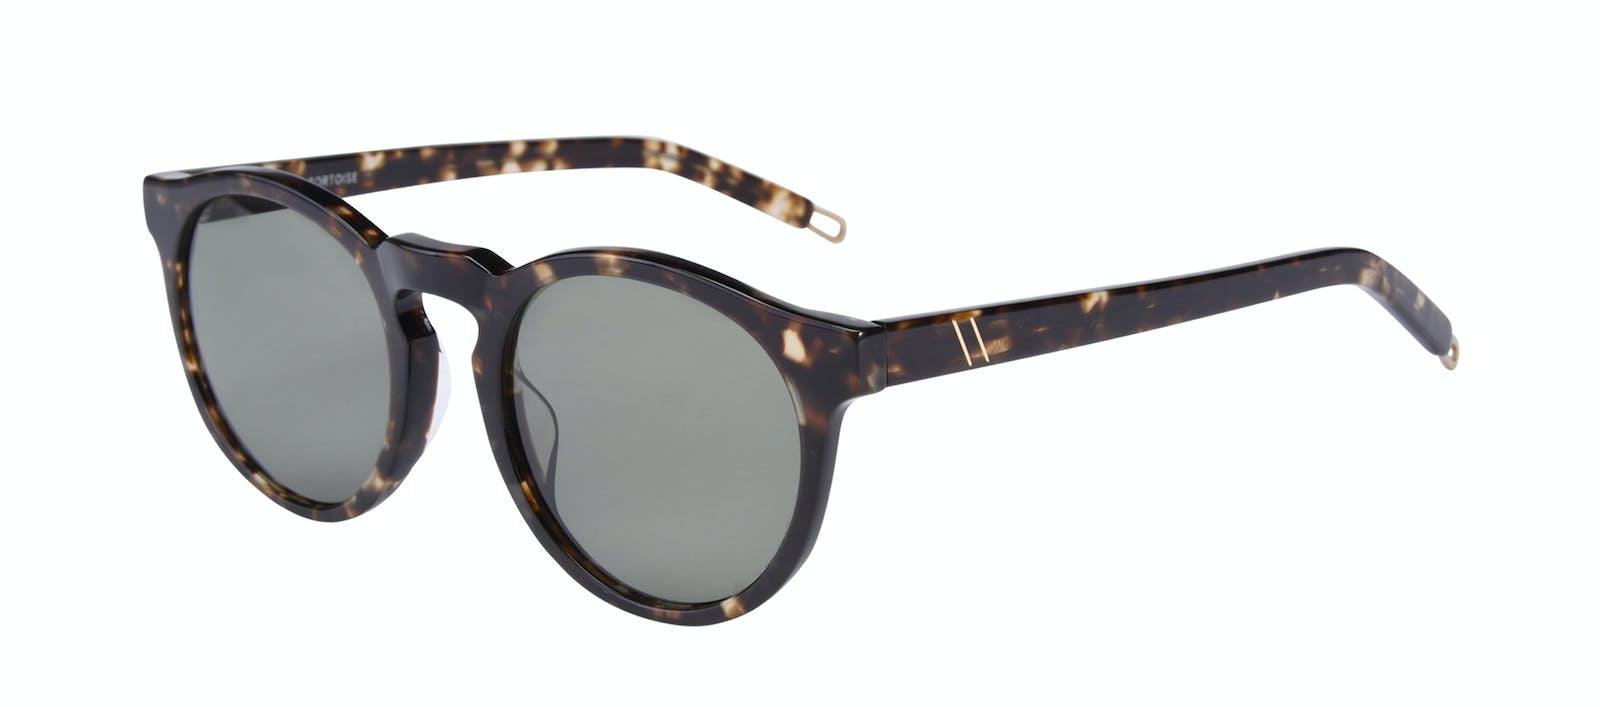 2c92f4c2cd6 Affordable Fashion Glasses Round Sunglasses Men Ace Tortoise Tilt